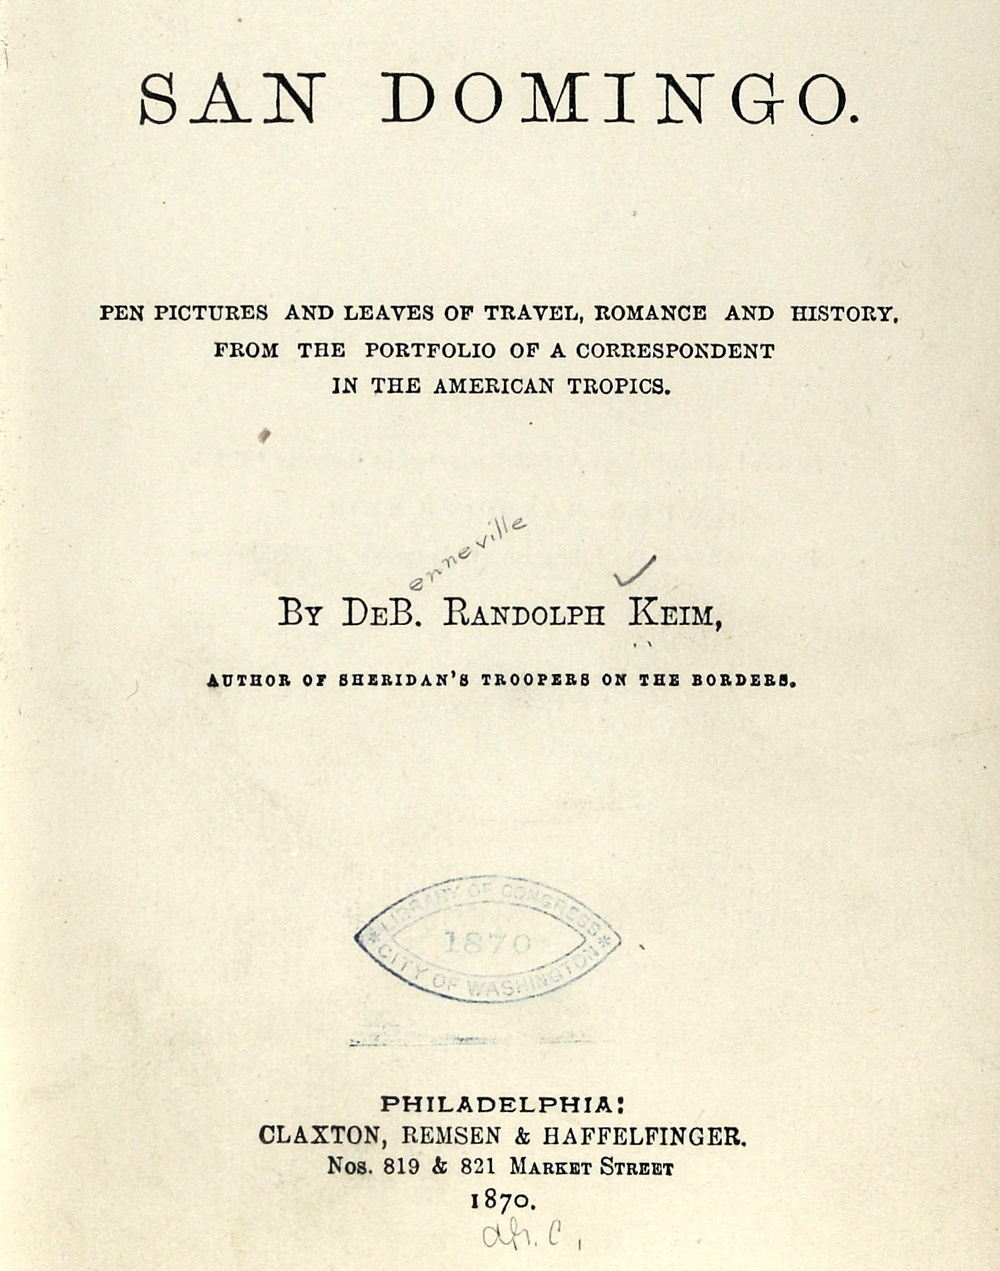 Public domain, via the Library of Congress.